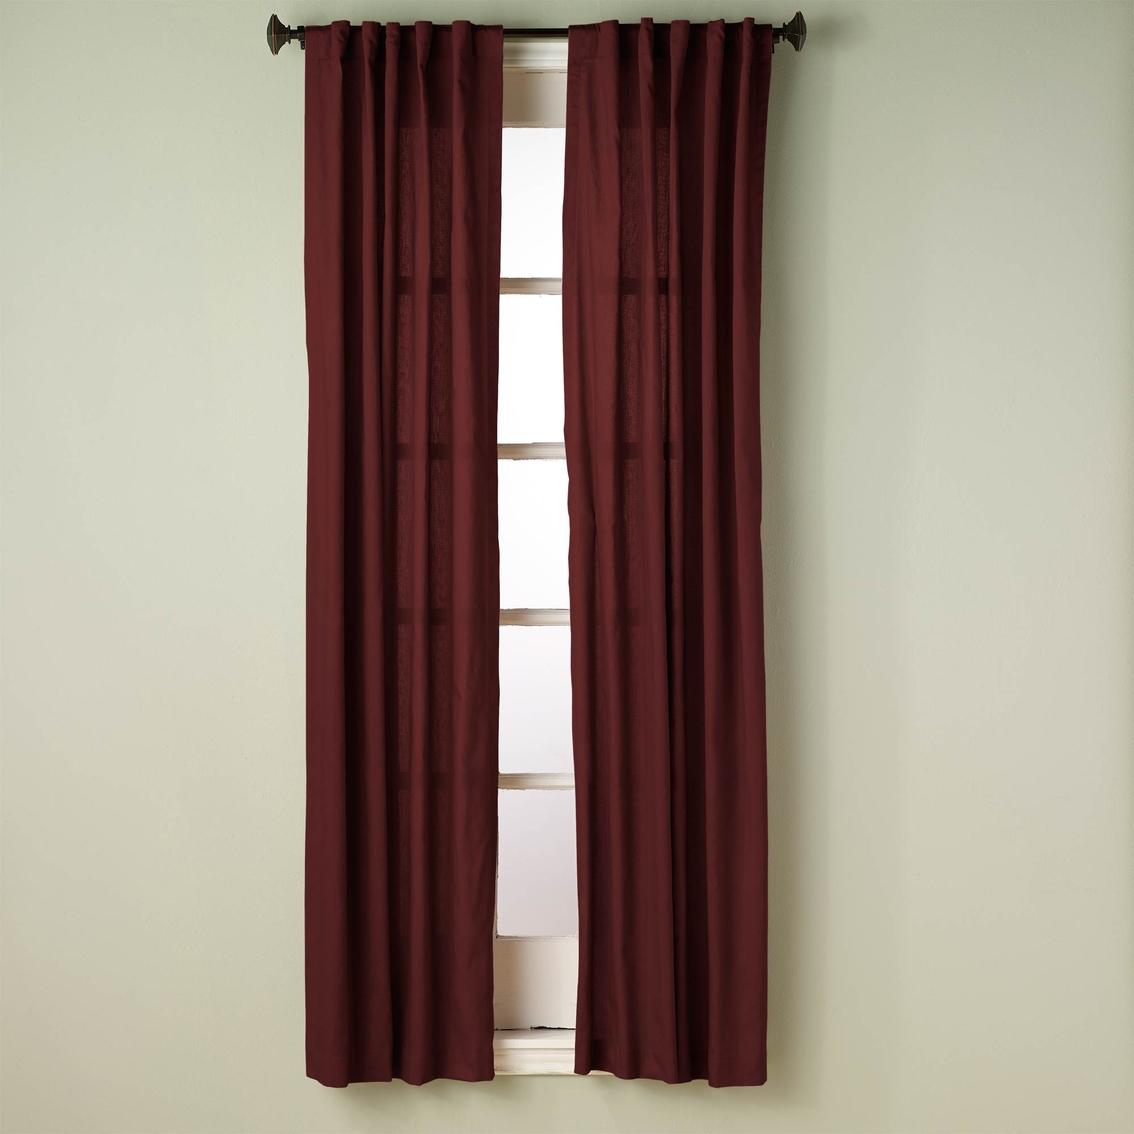 50 X 84 Curtain PanelsMadison Park Joycelyn Cotton  : 40721681516 from algarveglobal.com size 1134 x 1134 jpeg 398kB